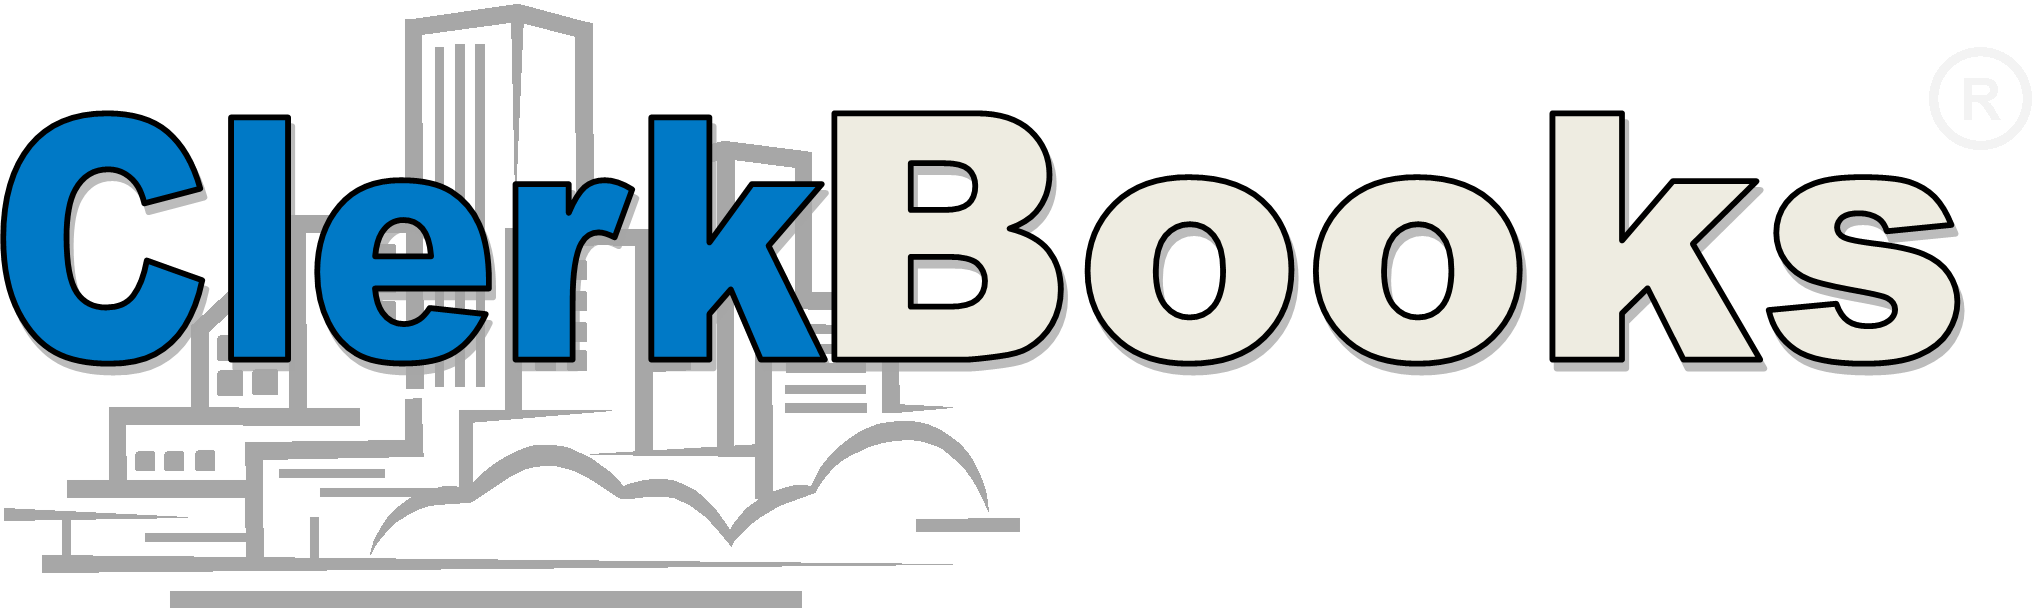 Clerkbooks municipal made easy. Finance clipart accounting clerk